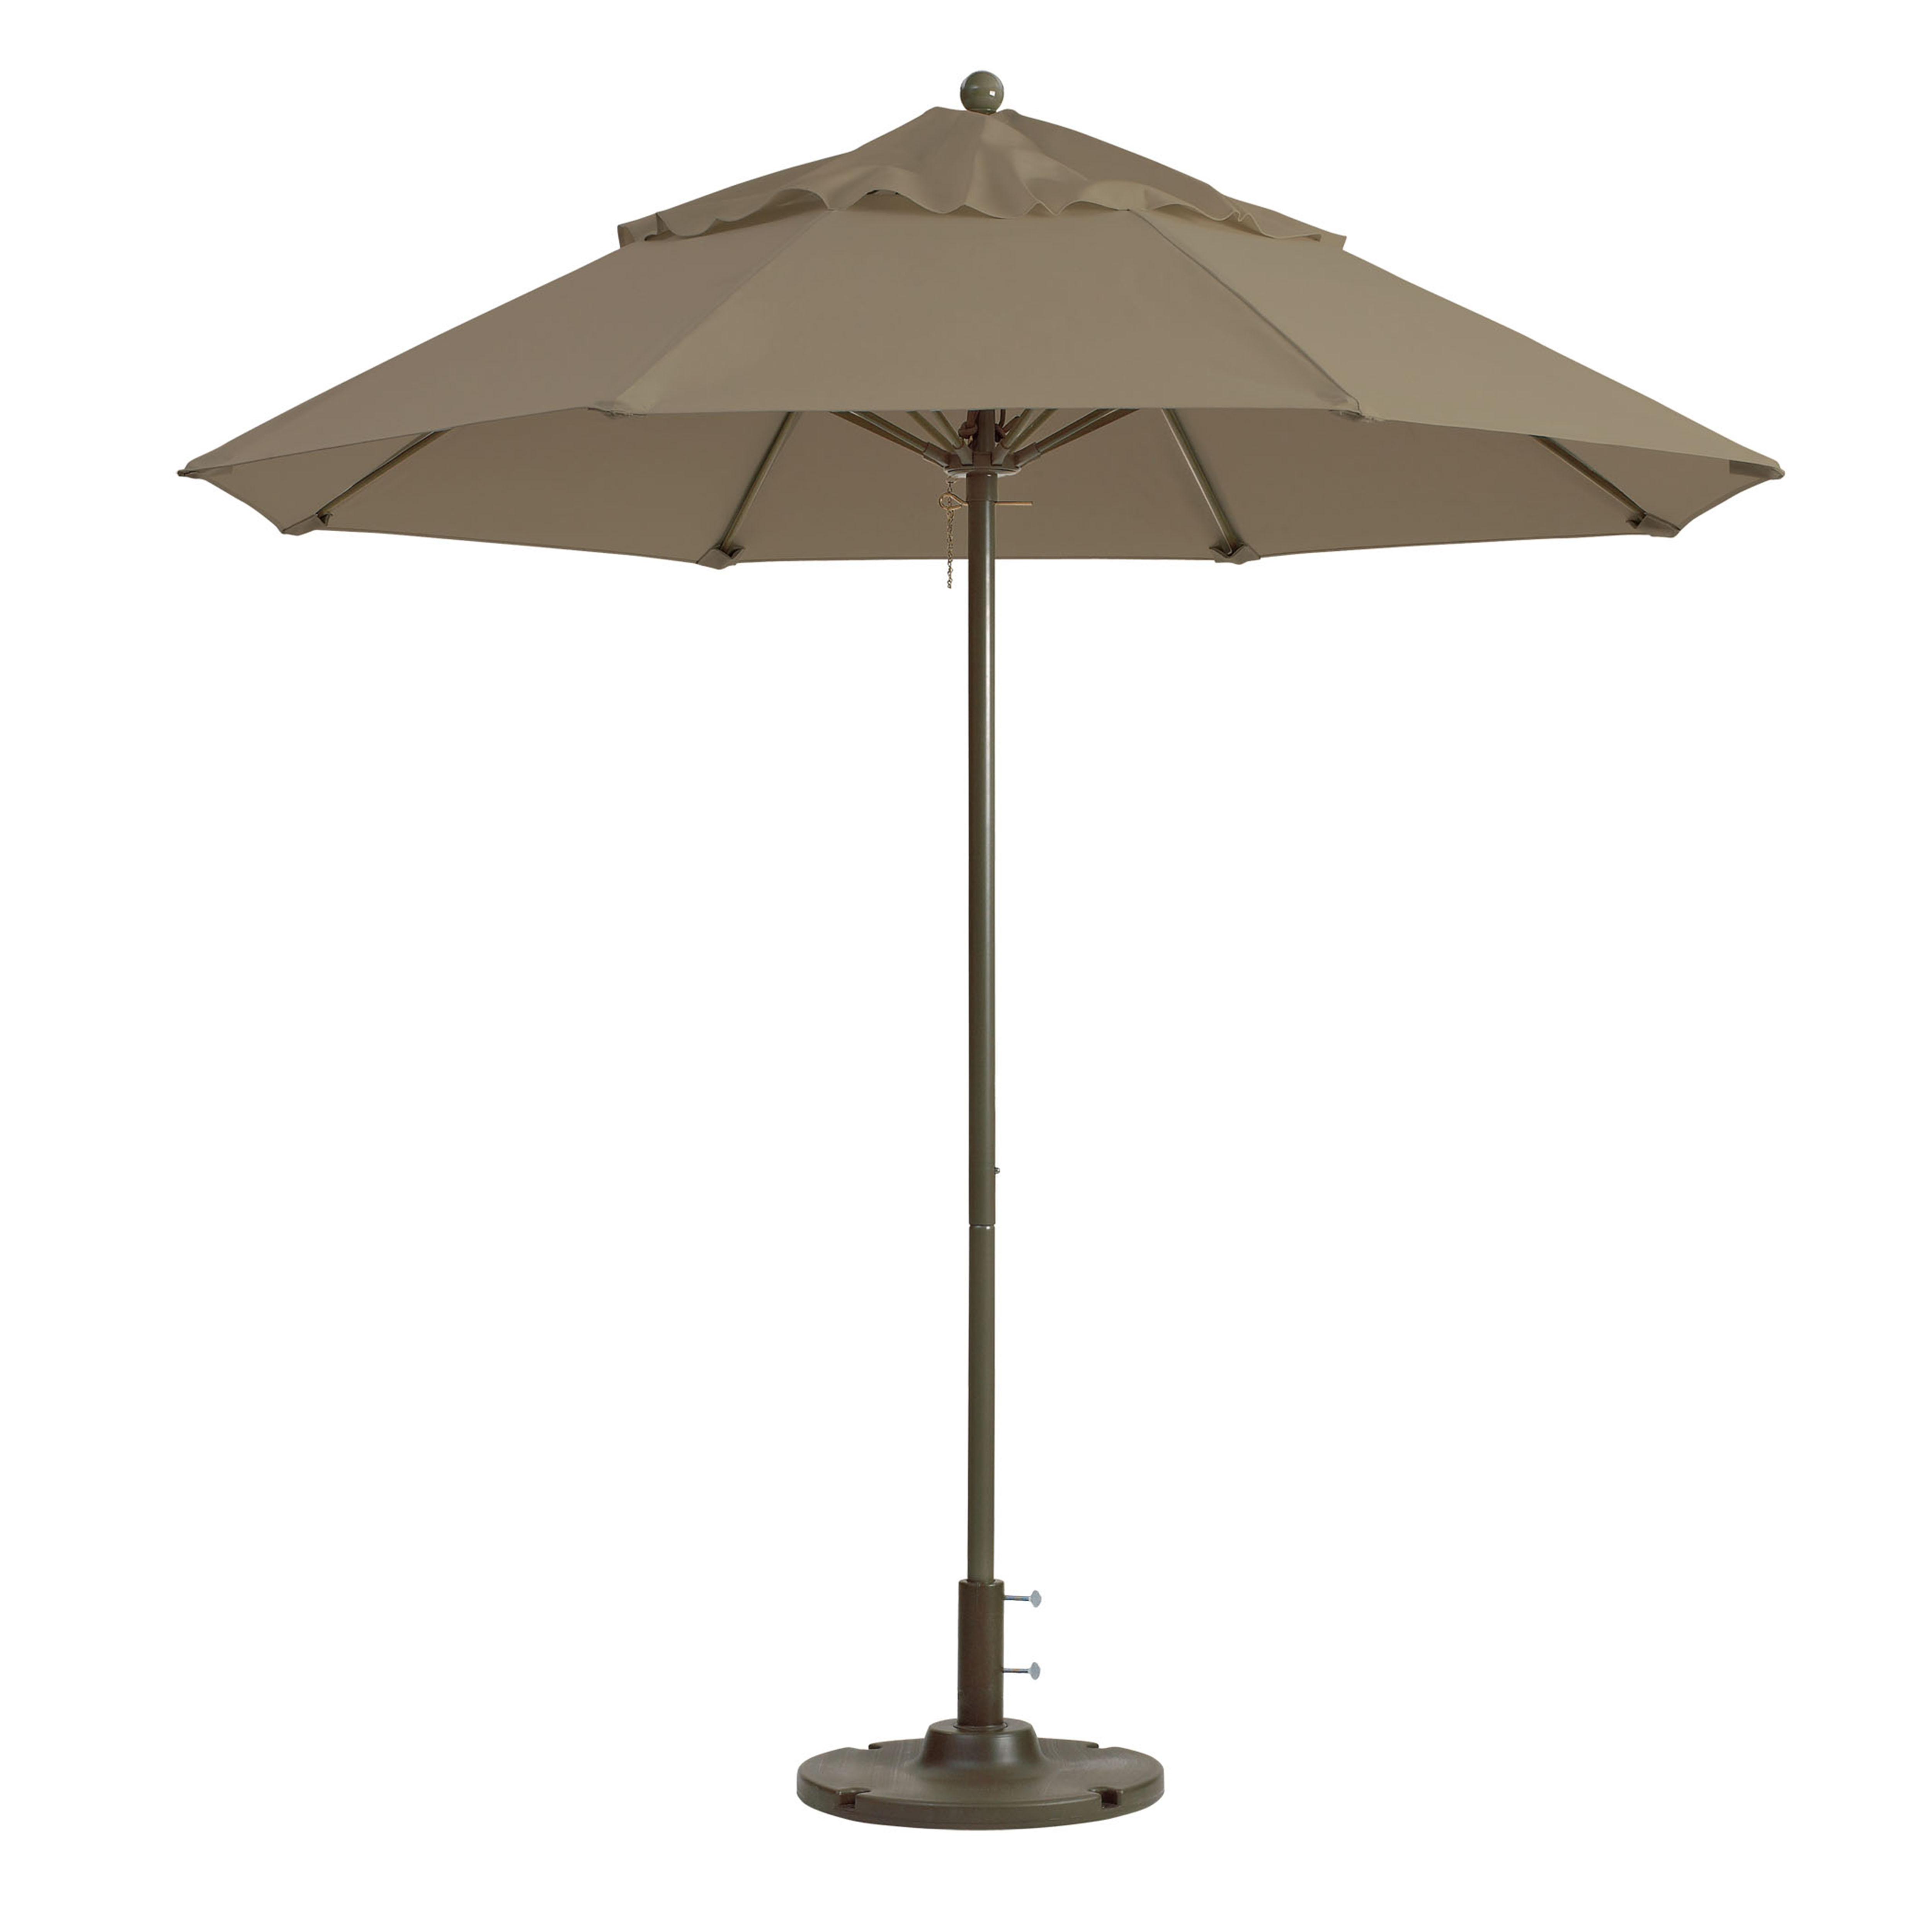 Grosfillex 98868131 umbrella